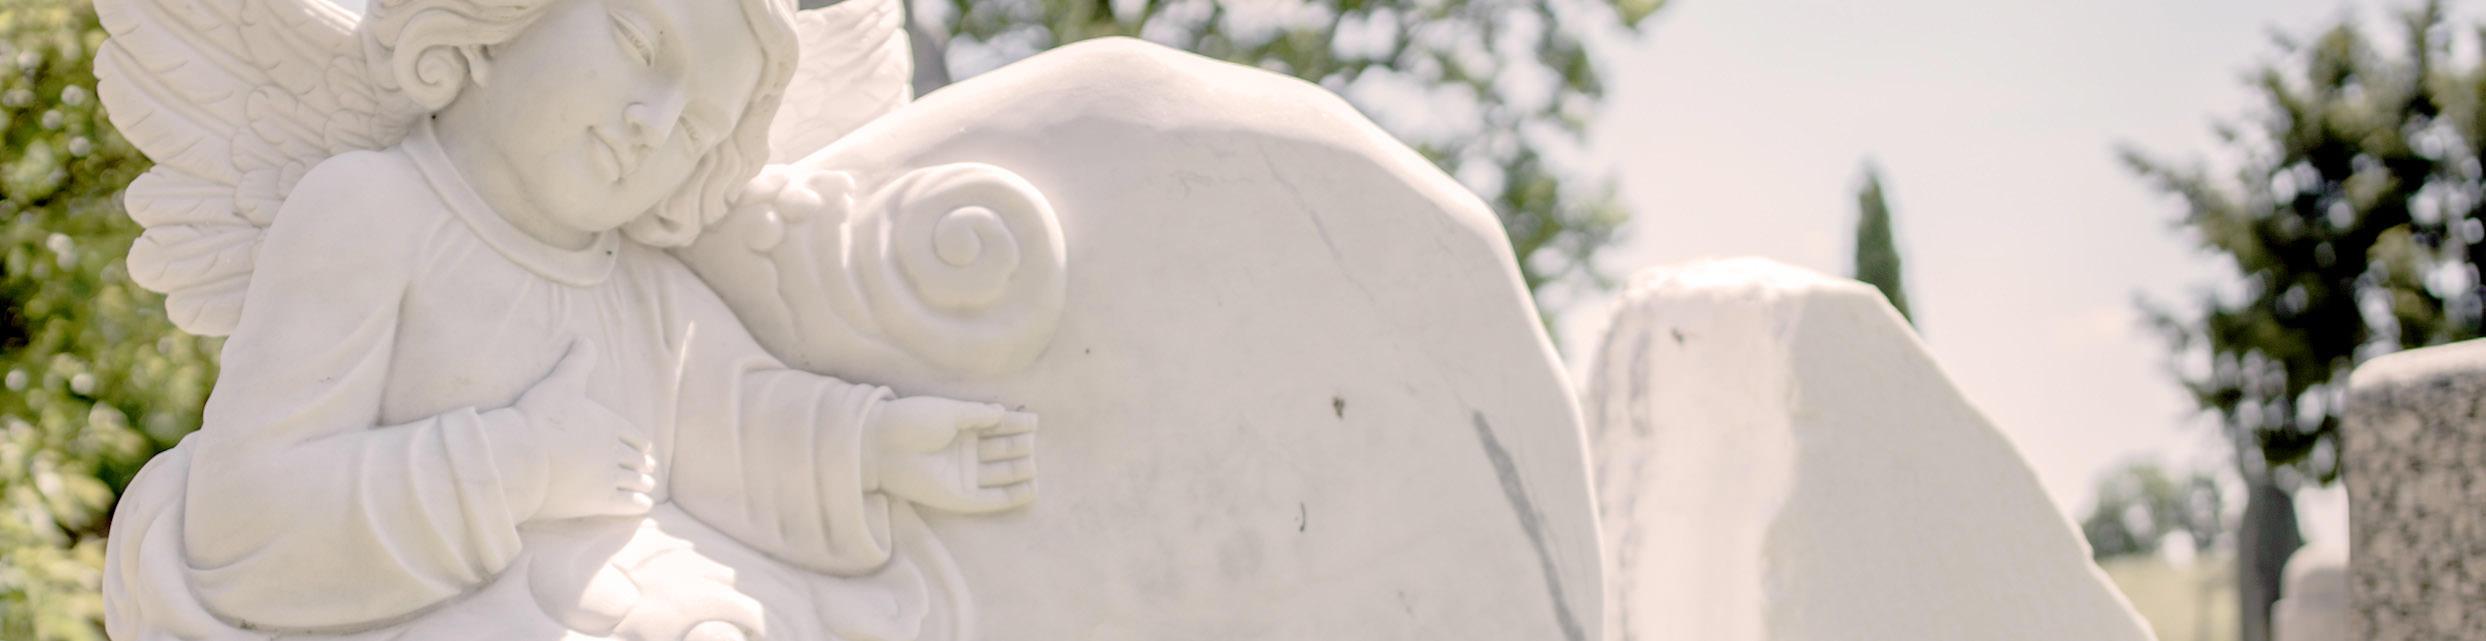 Franke Naturstein - Grabdenkmäler zu fairen Preisen